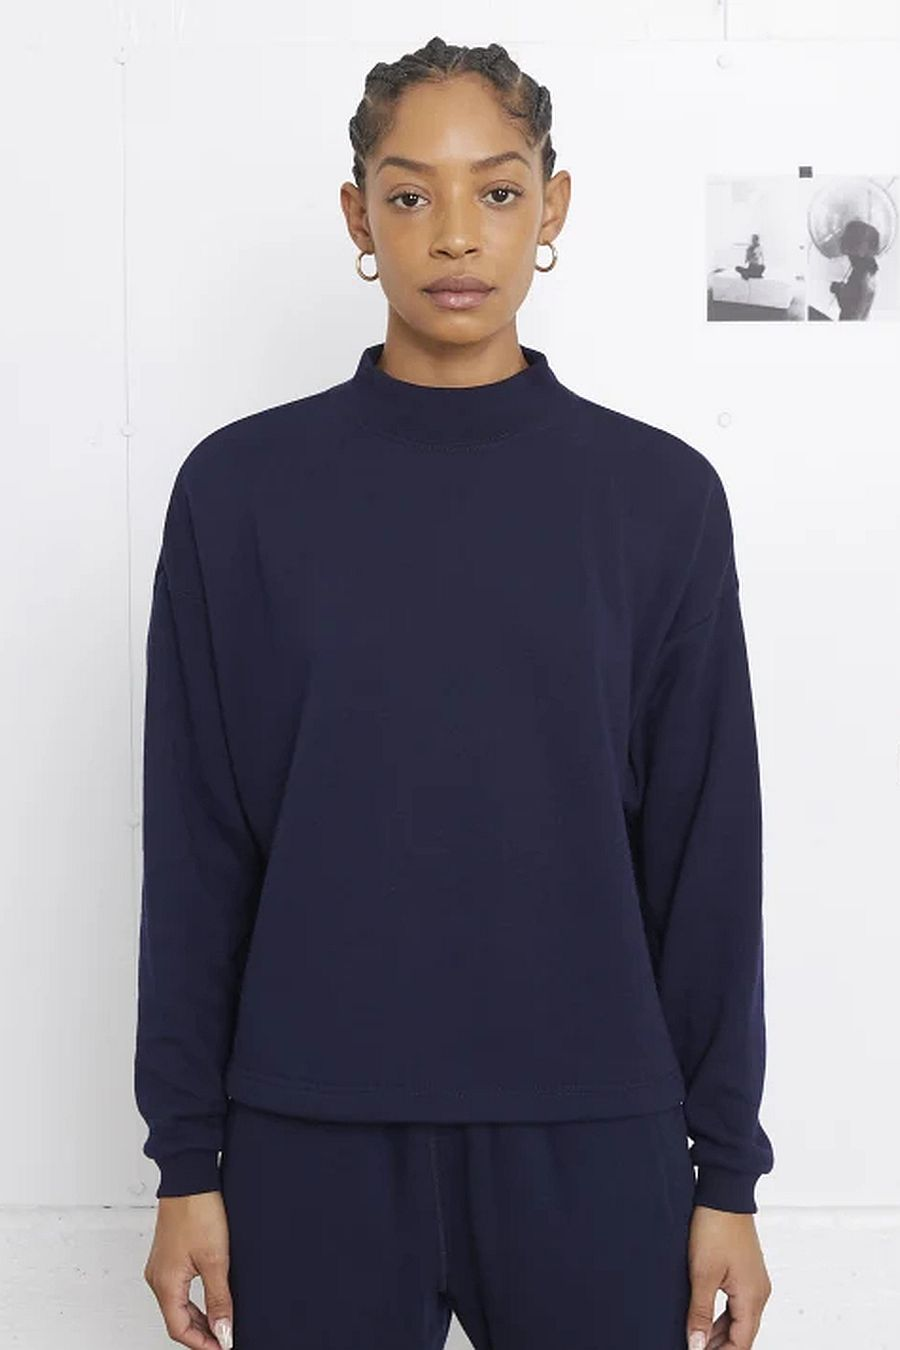 Entireworld Mock Neck Sweatshirt - Navy